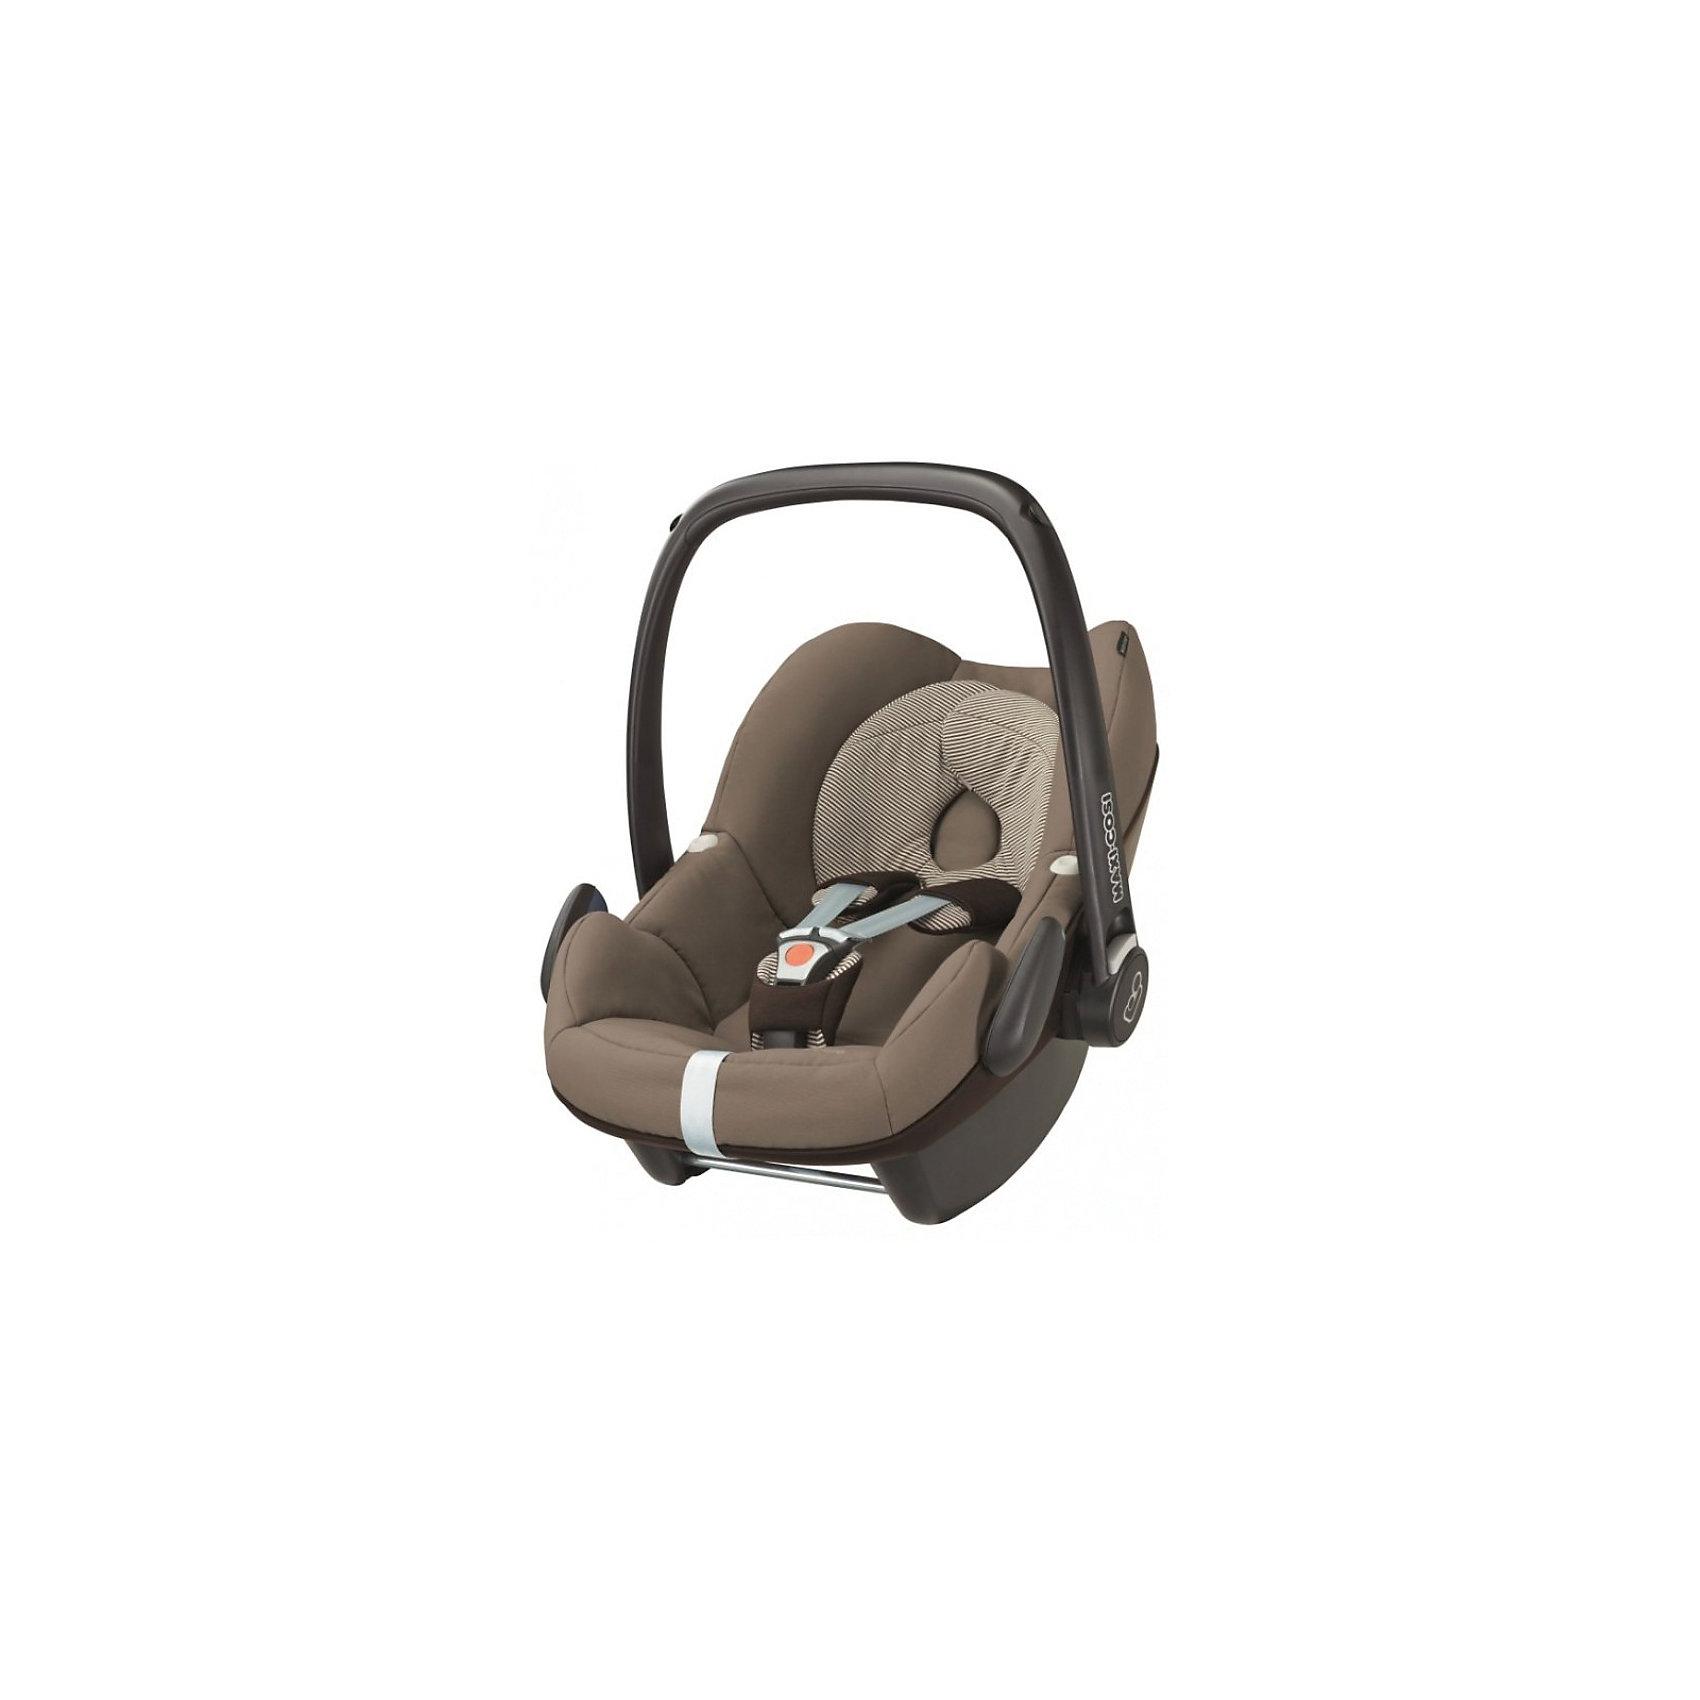 Автокресло Pebble 0-13 кг., Maxi-Cosi, Earth brown (Maxi Cosi)